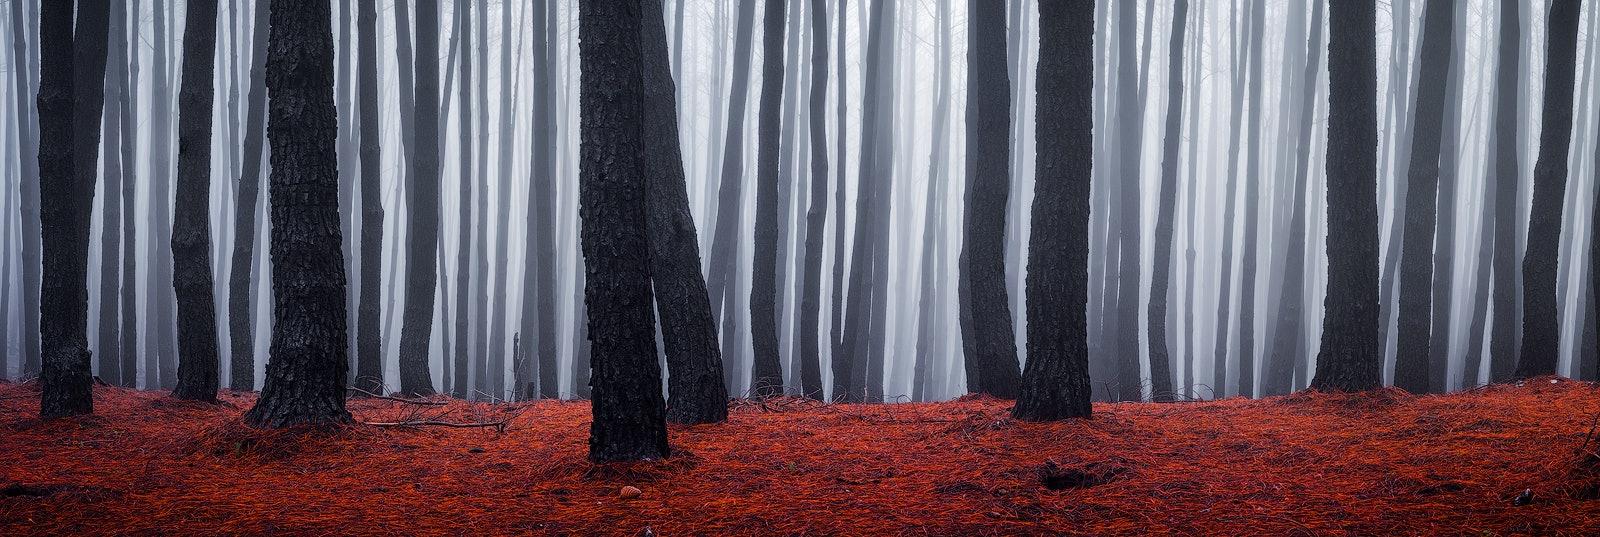 Outer Limits - Adelaide Hills, SA